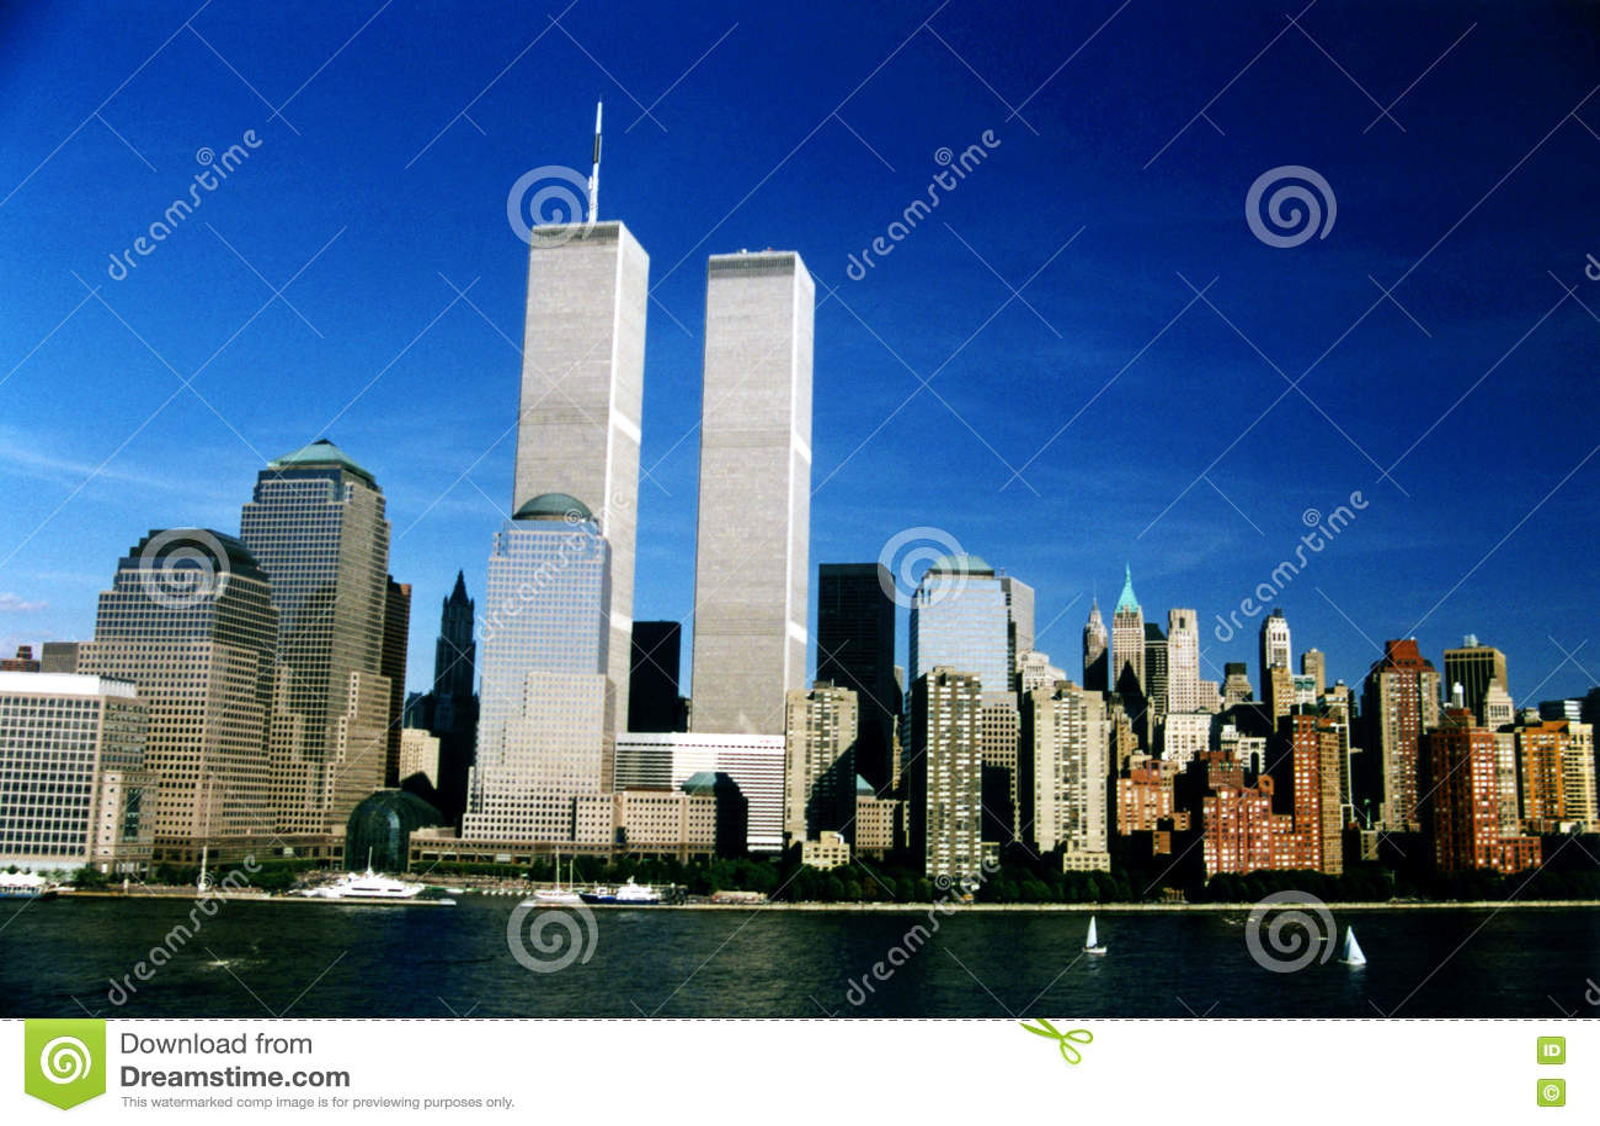 WTC双塔在纽约,美国